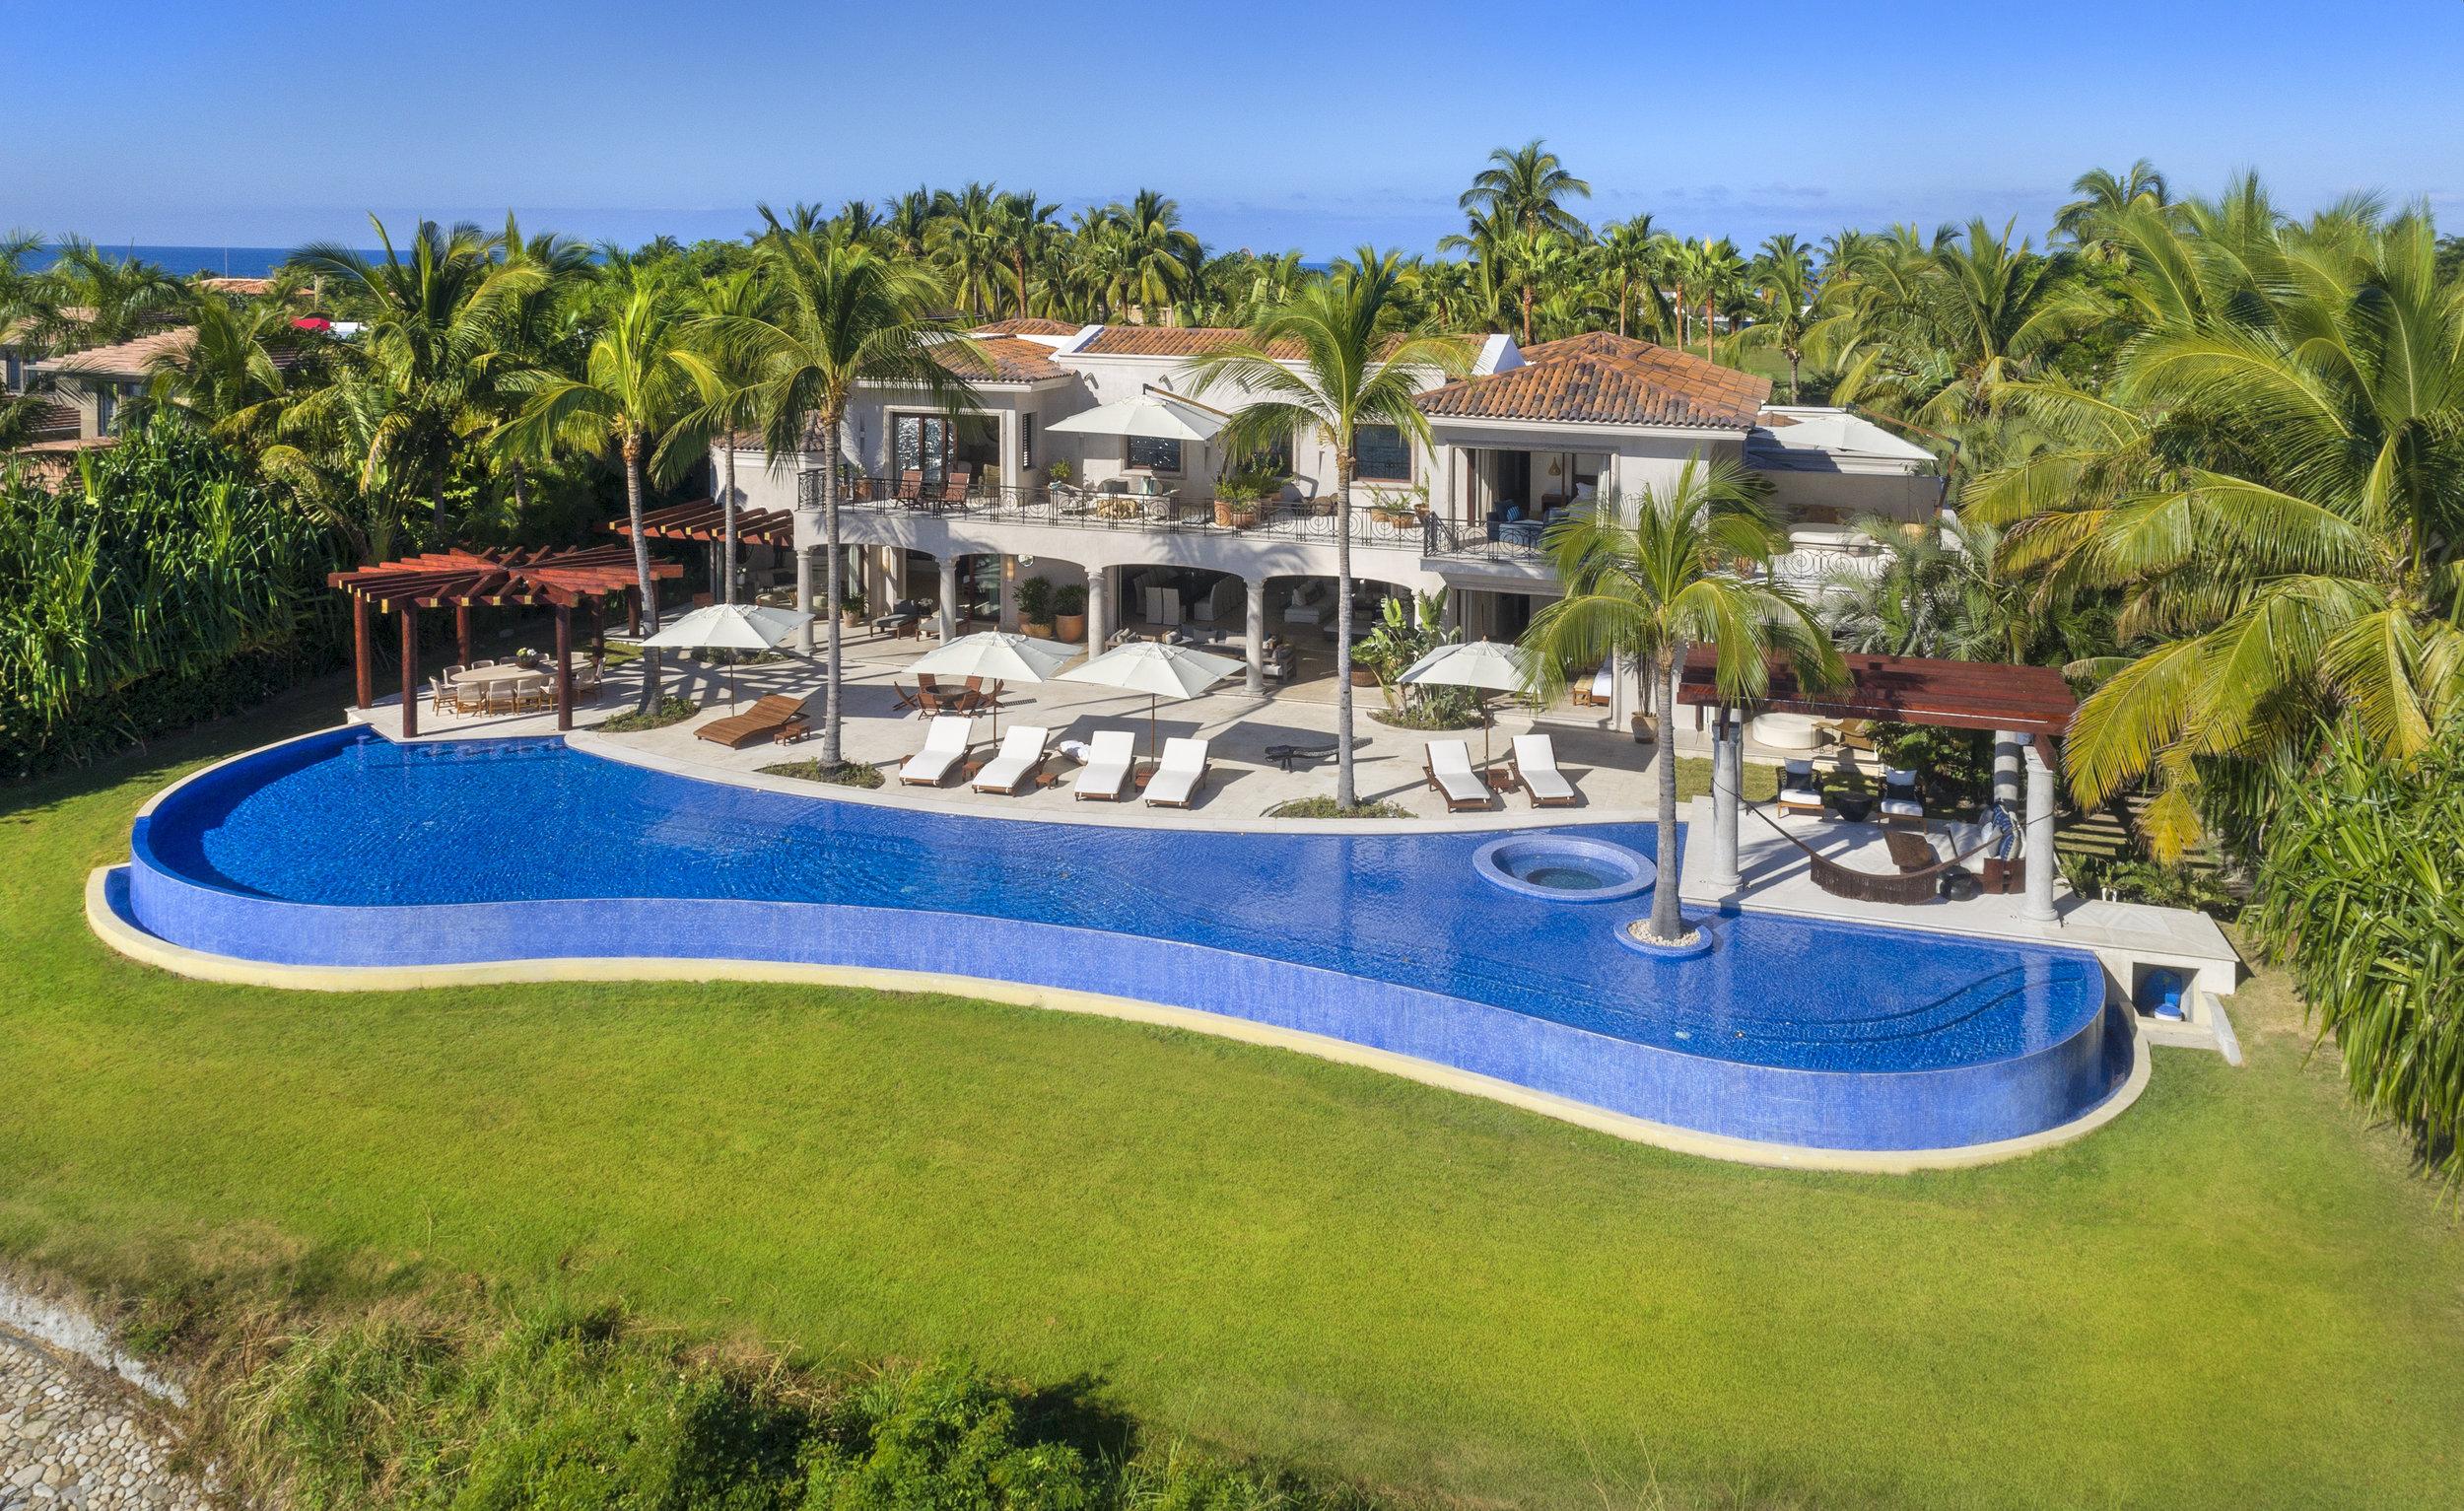 Casa la VIda_aerial 1.jpg